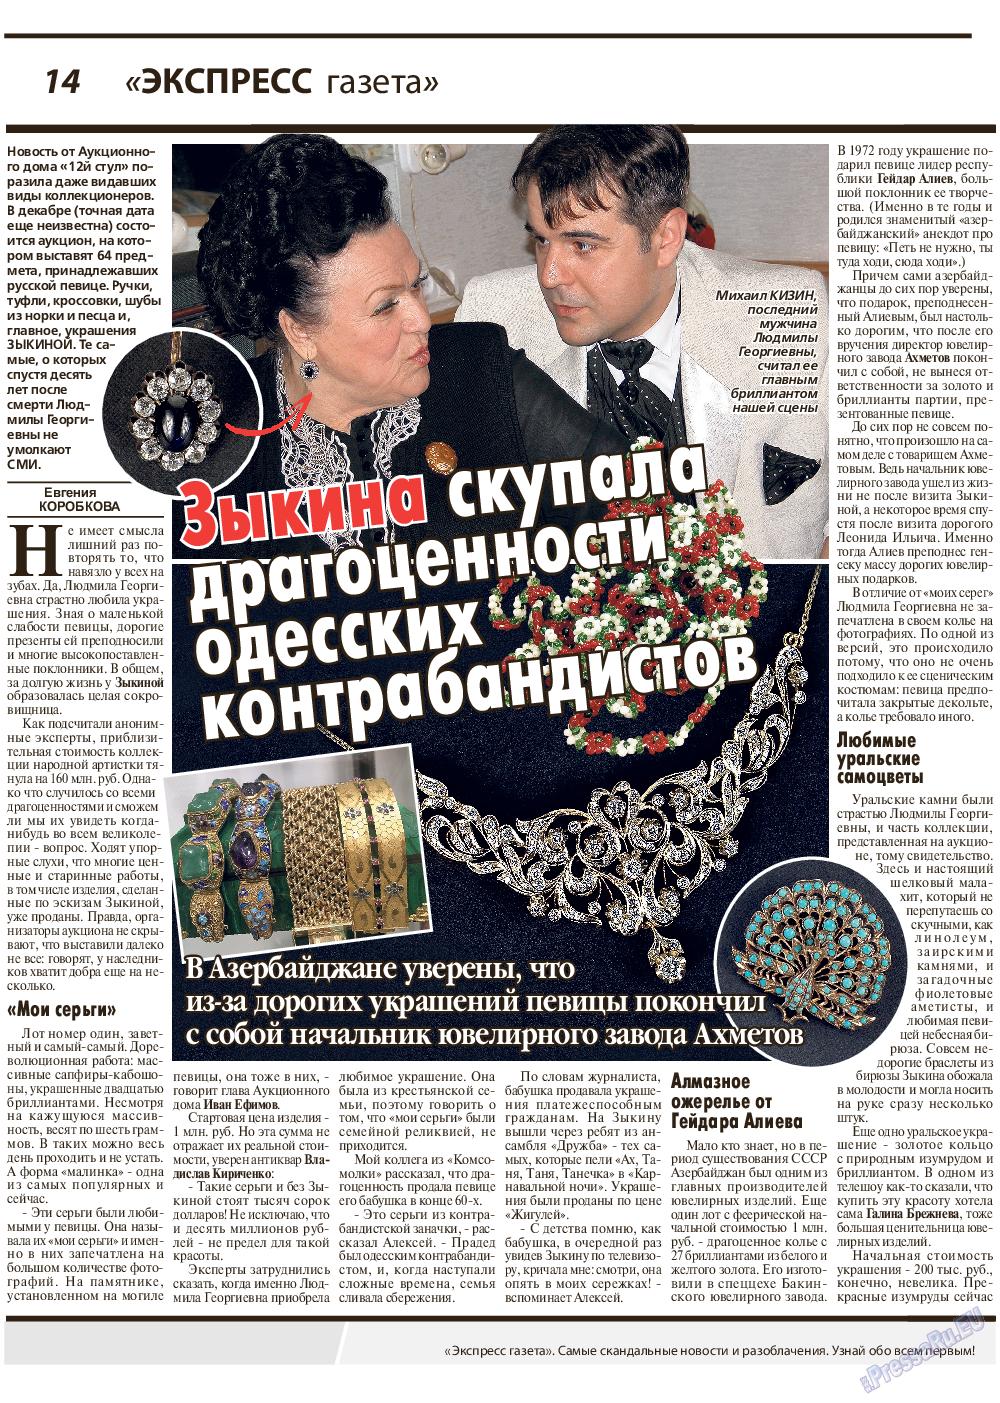 Экспресс газета (газета). 2020 год, номер 1, стр. 14